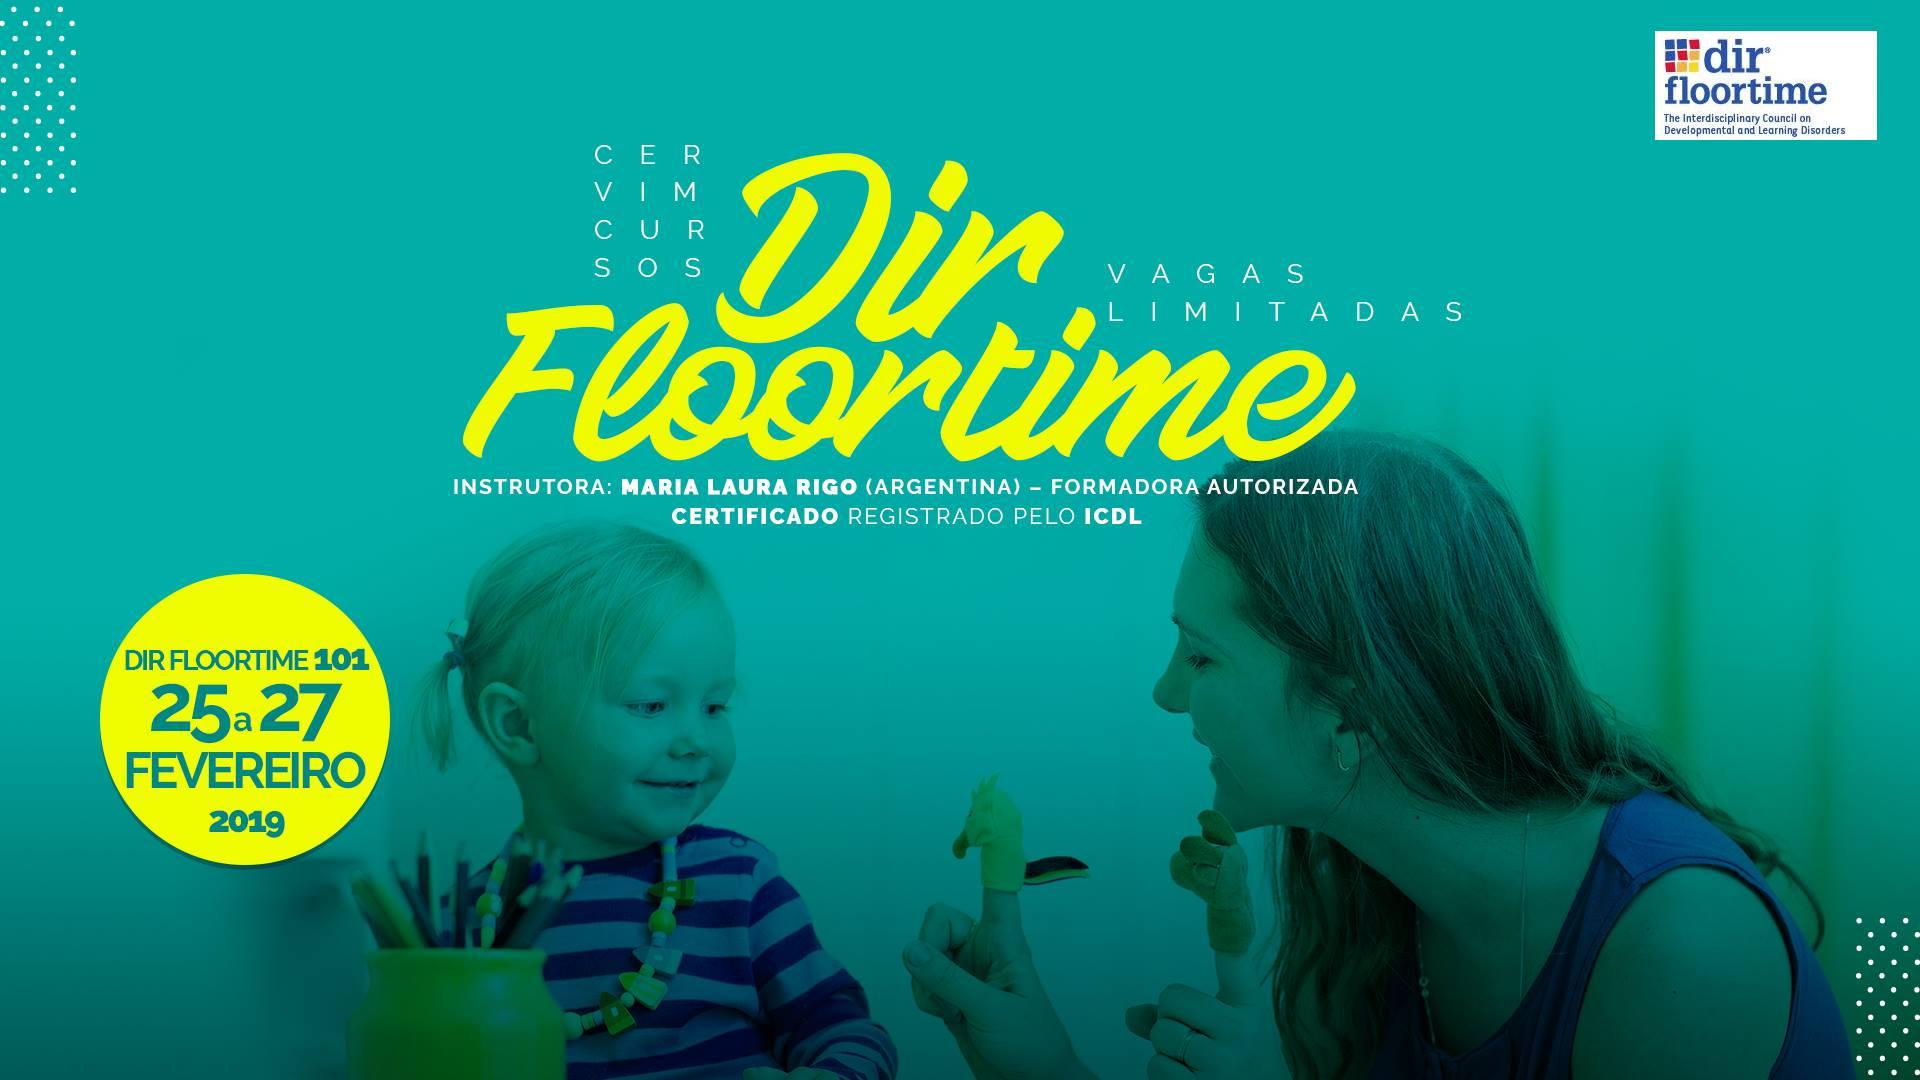 Curso Dir Floortime 101